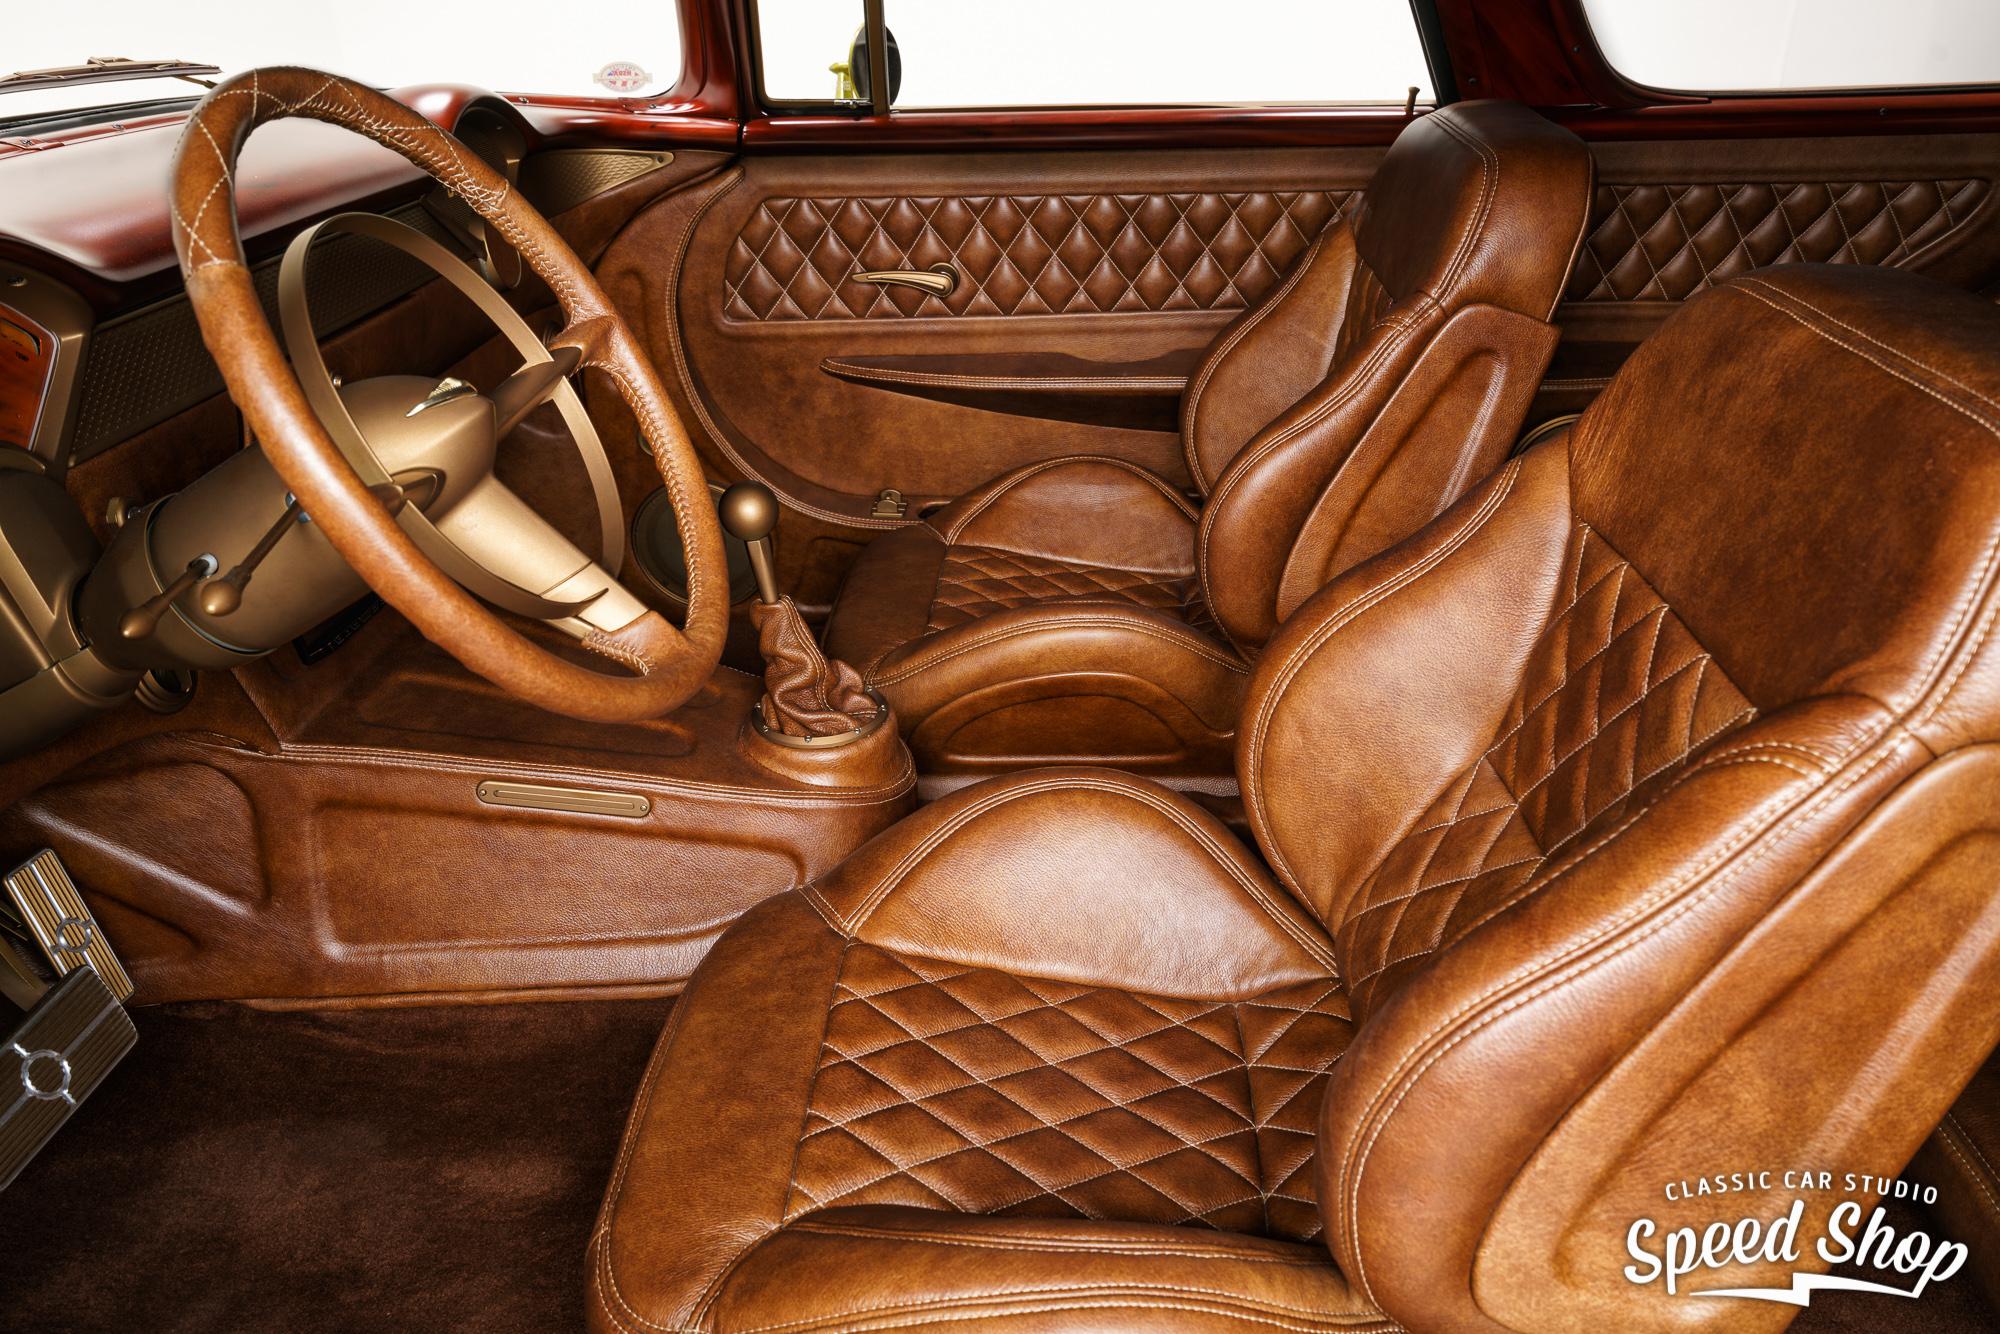 1955 Chevrolet Nomad interior